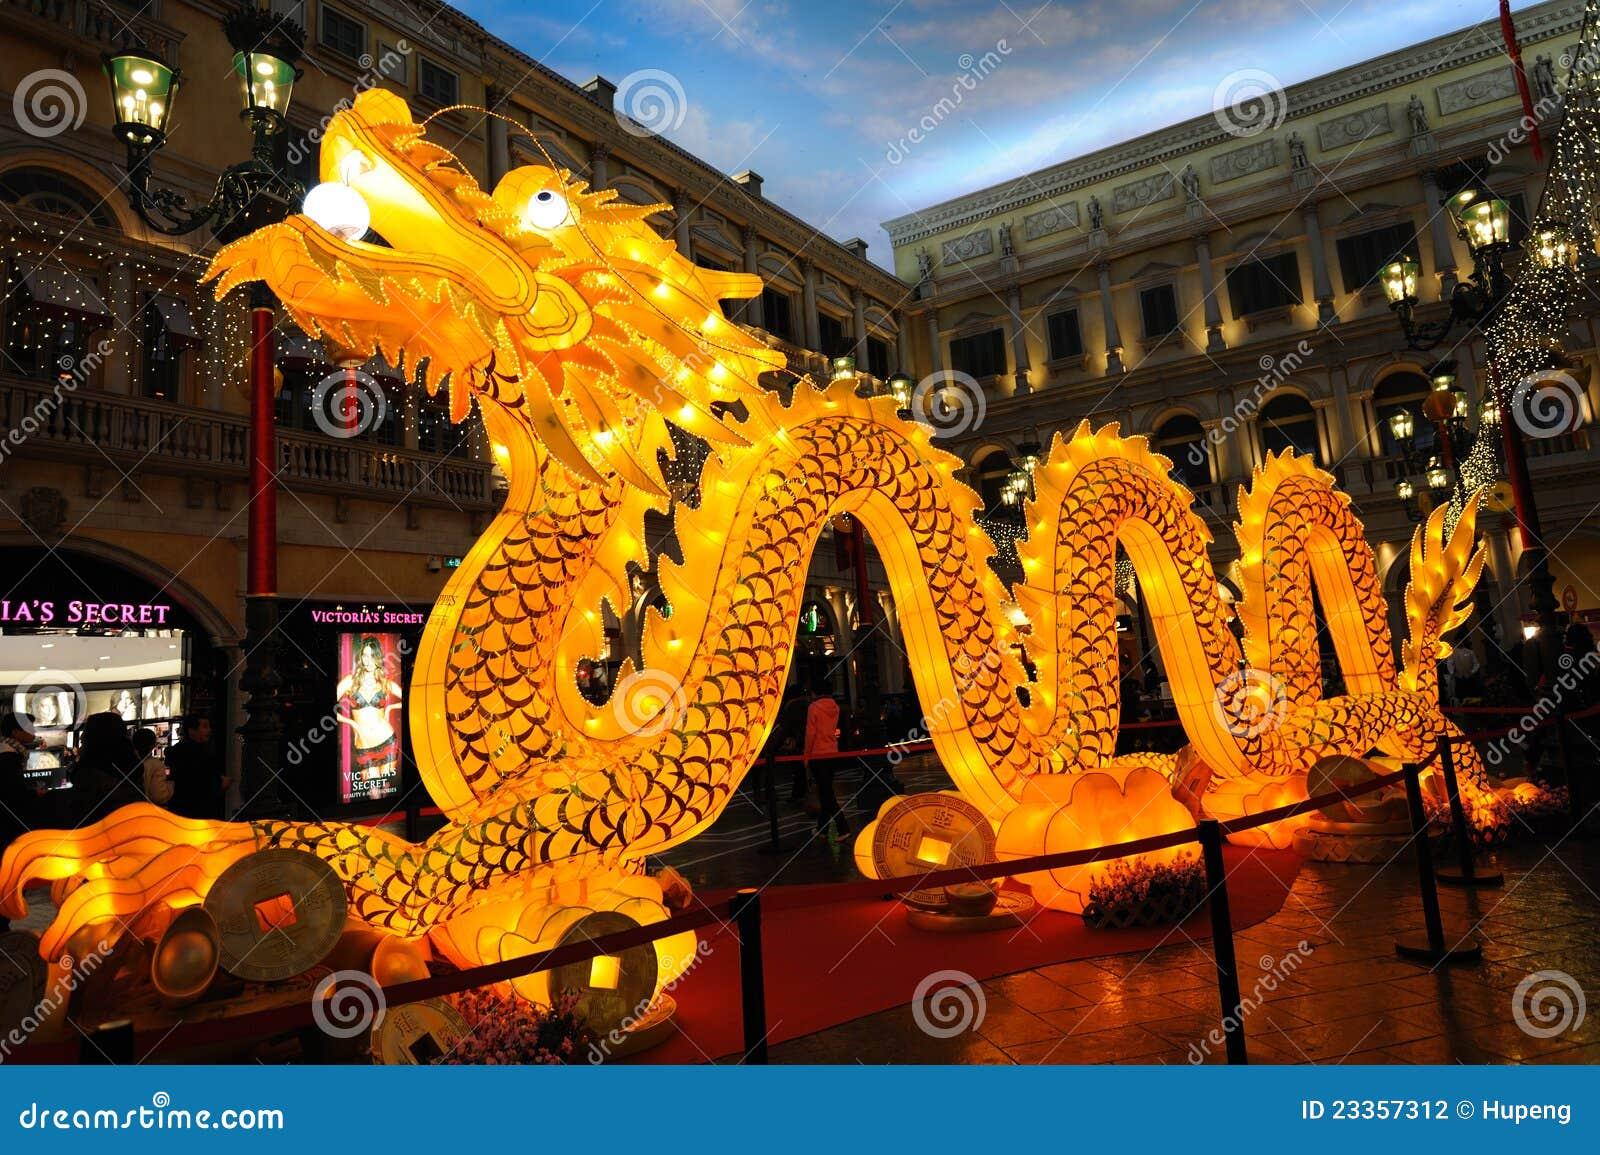 lighting dragon in the venetian editorial photography